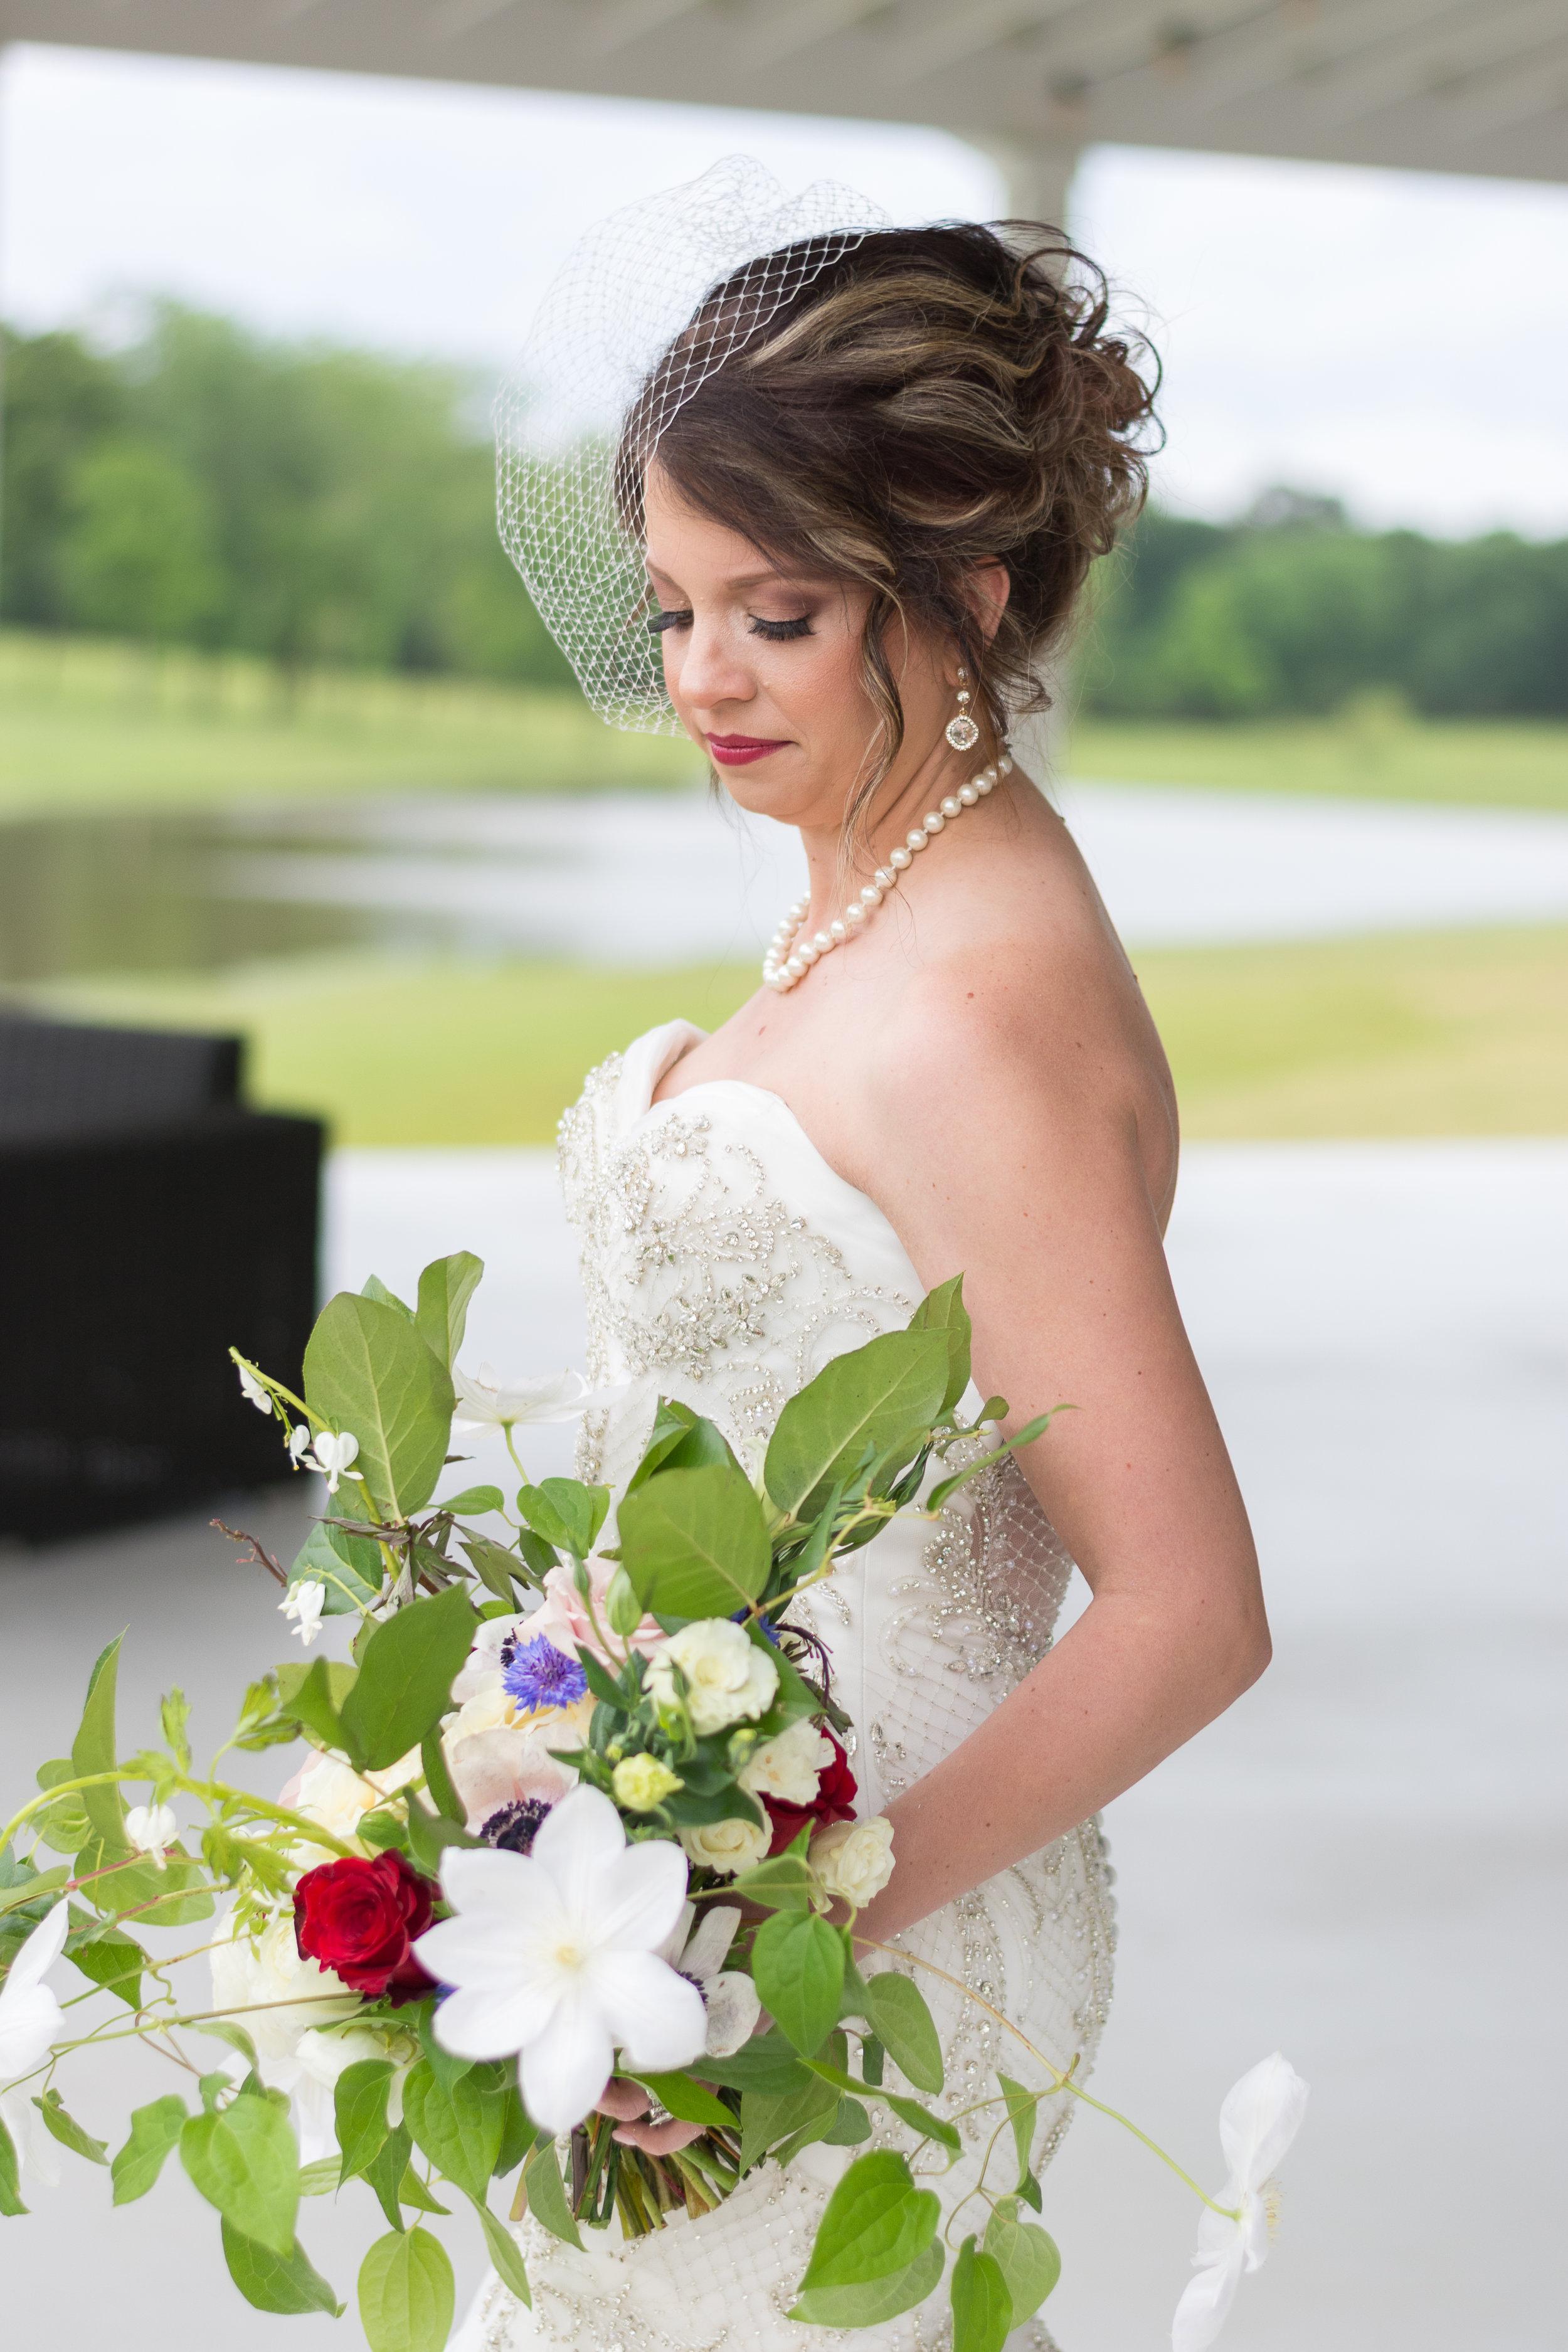 bridal portraits, wedding gown, the woodlands tx wedding photographer, montgomery tx weddings, magnolia, conroe tx wedding photography, houston tx weddings, willis, spring tx wedding